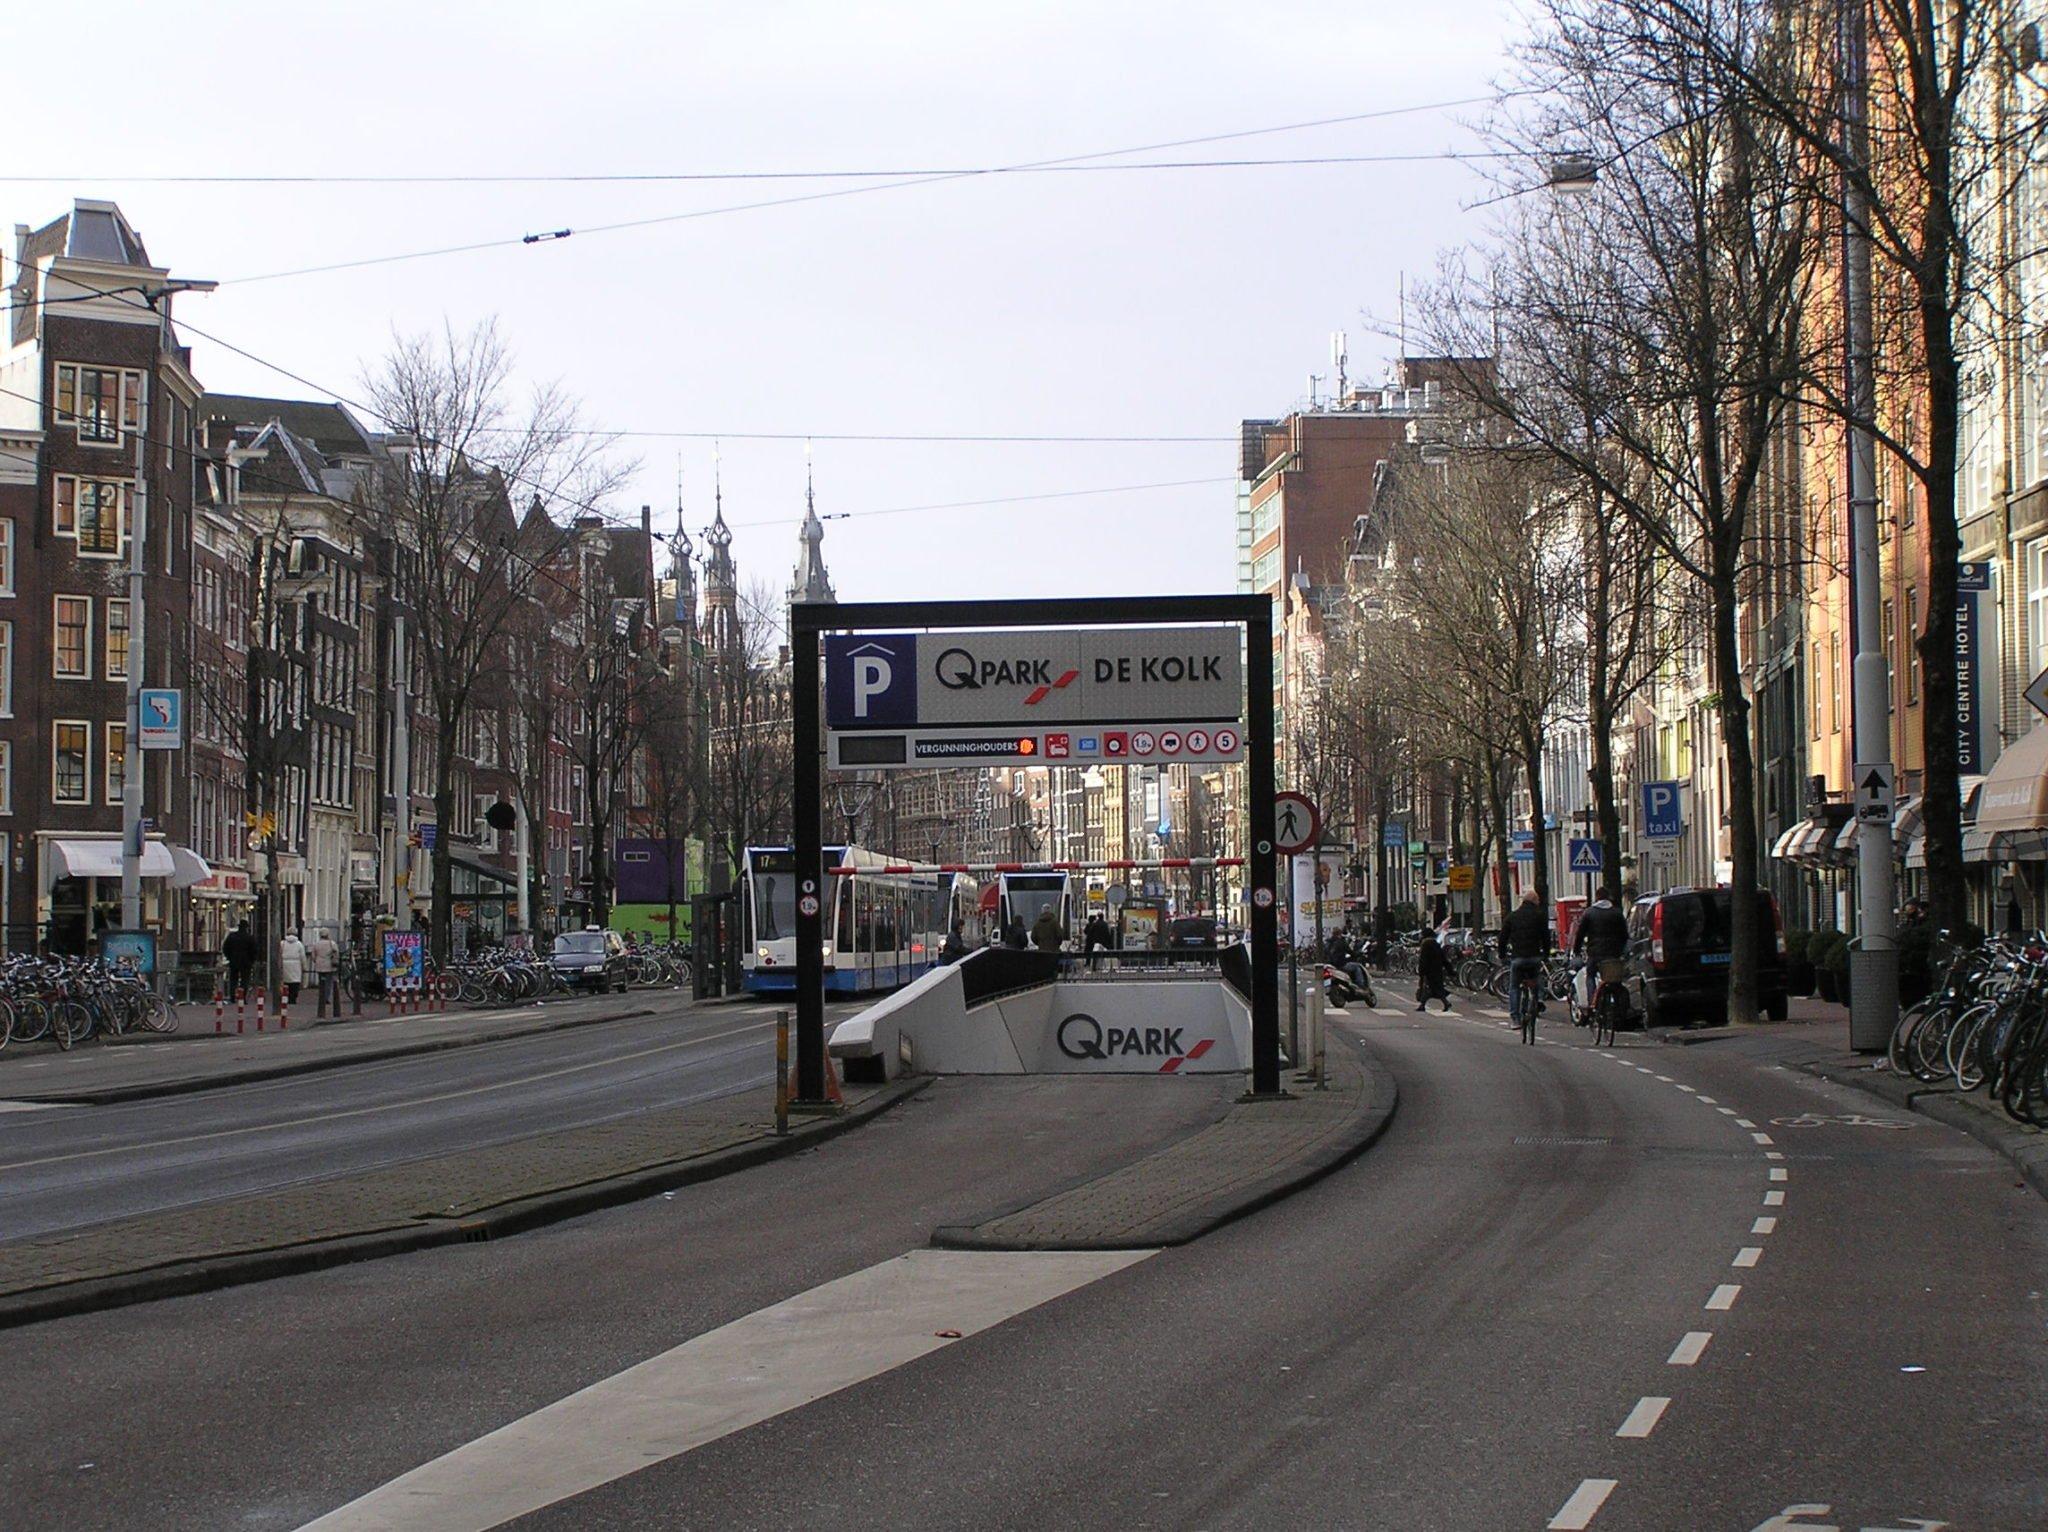 Q Park Amsterdam